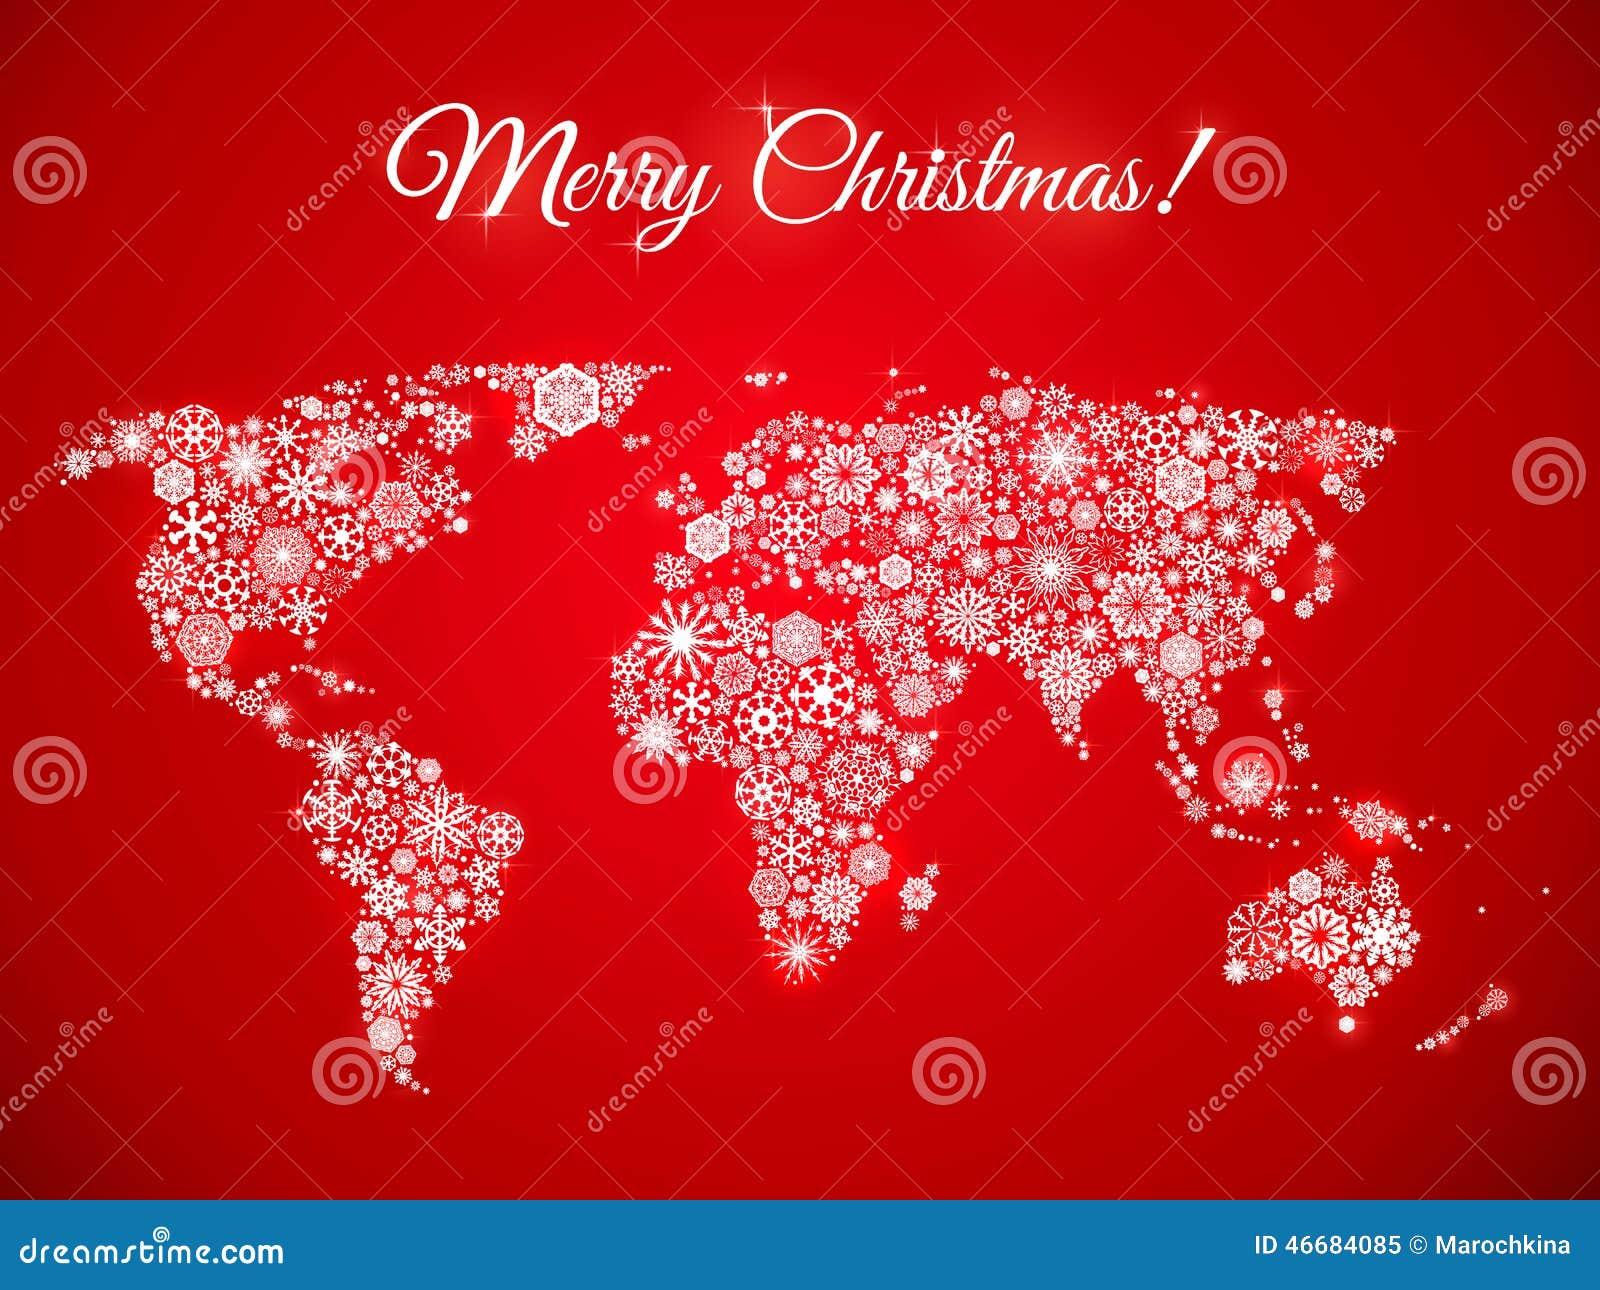 Christmas In Australia Background.Christmas Background Stock Vector Illustration Of Australia